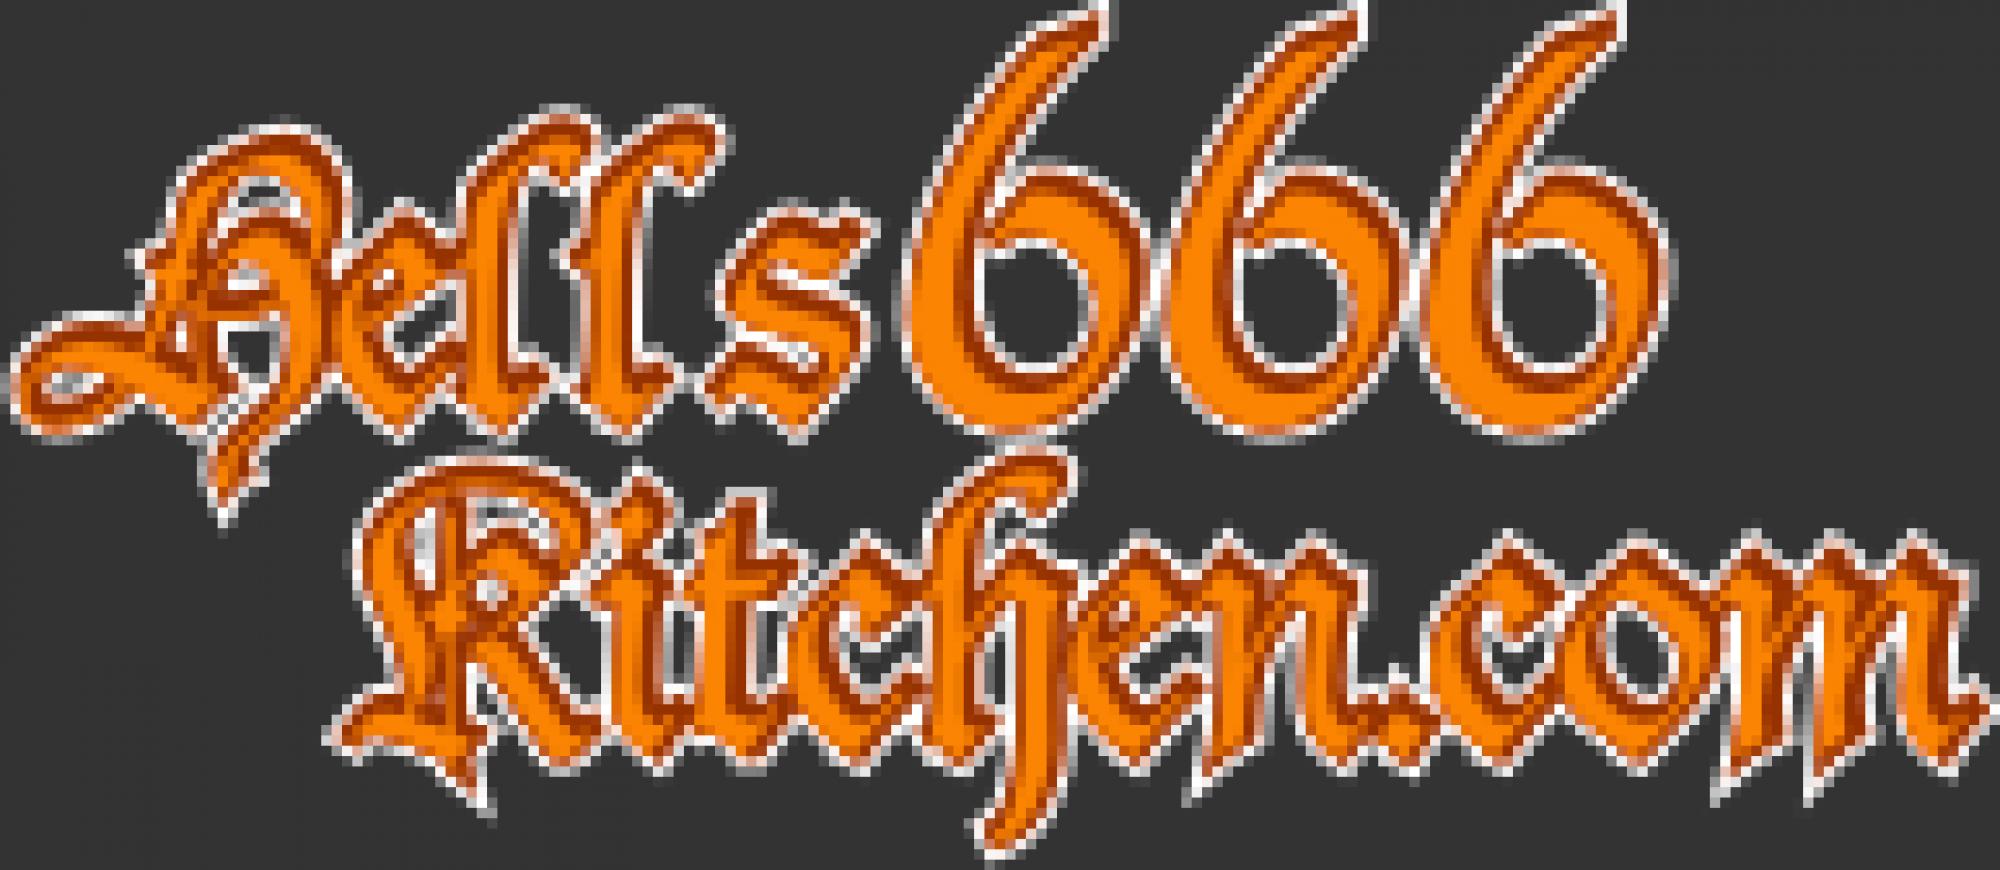 hellskitchen666.com